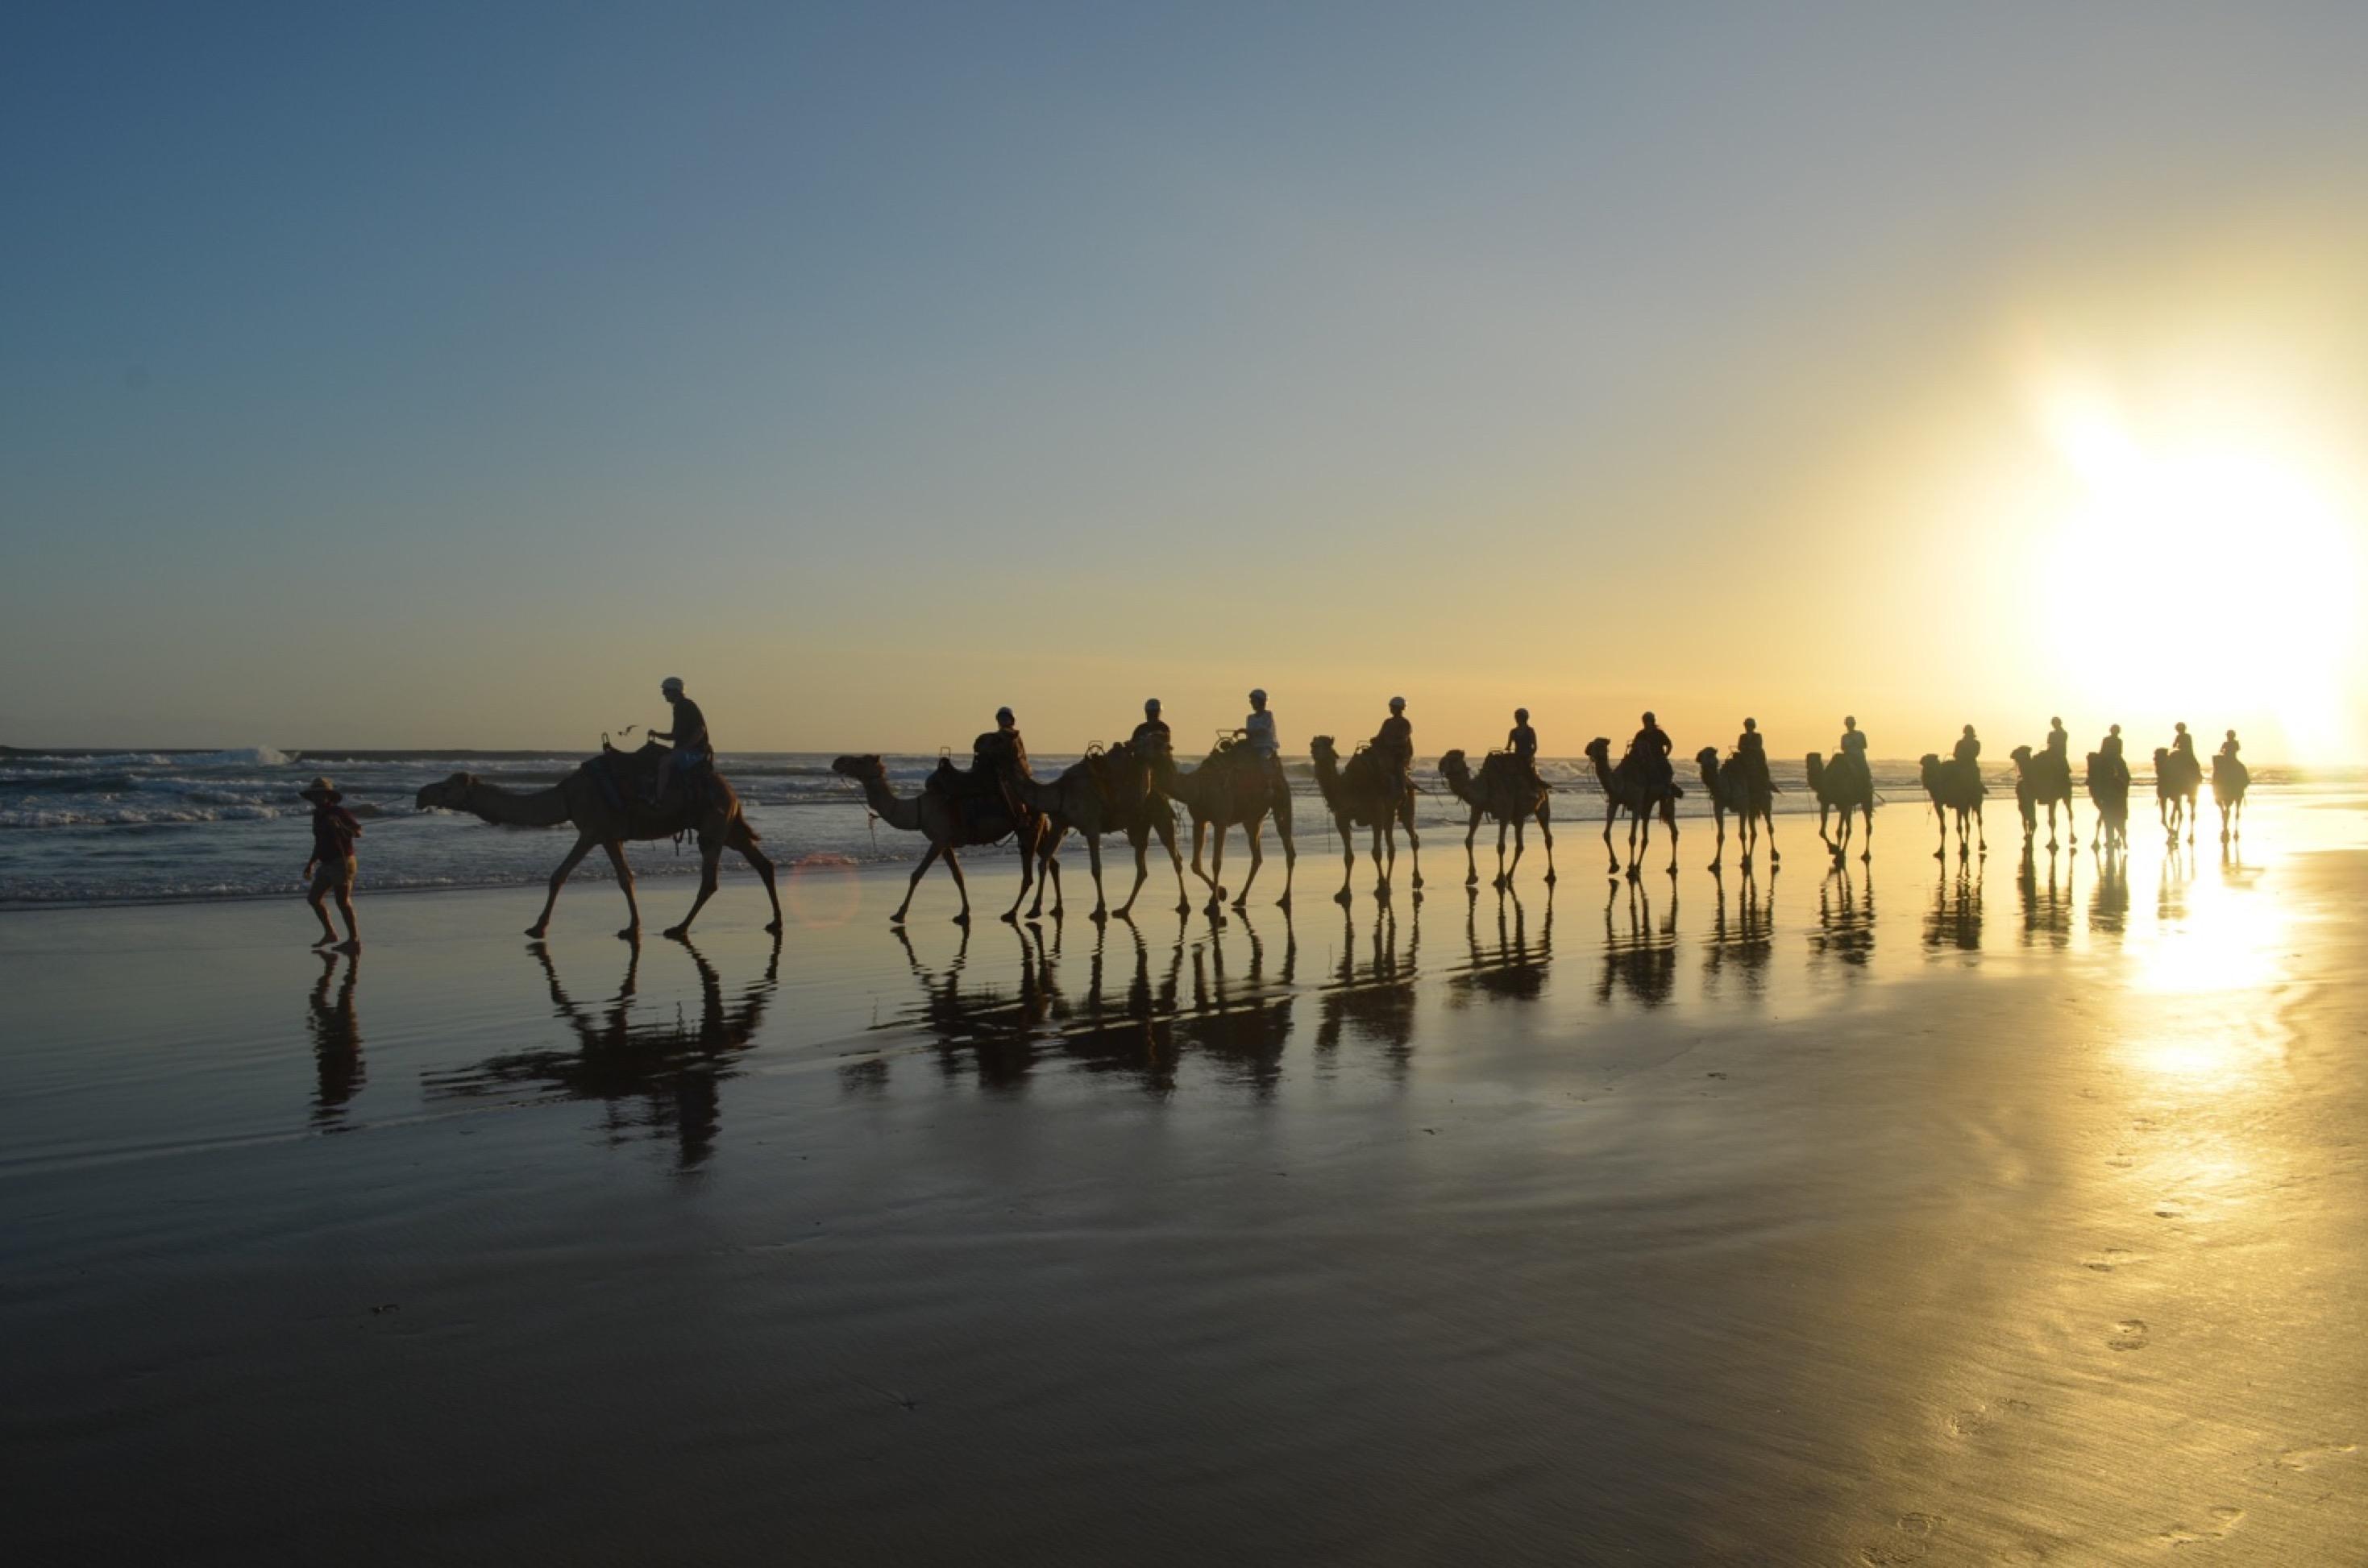 Sunset Camel Riding (60 Minutes)